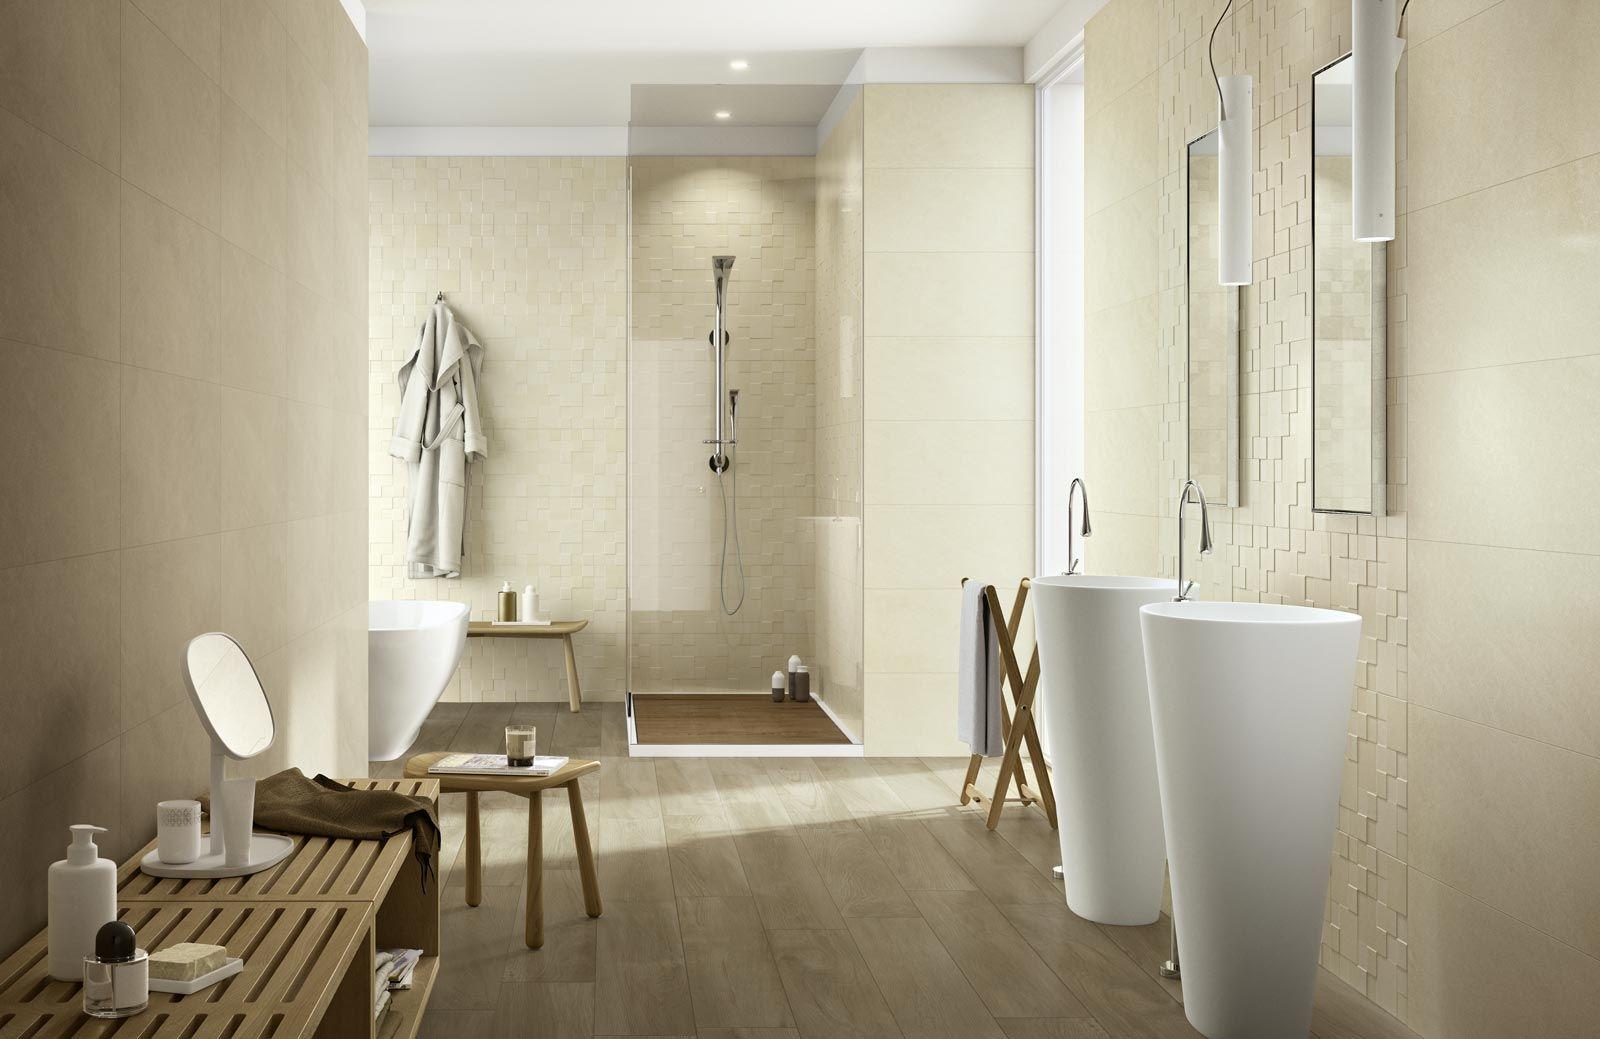 Bagno detox ~ Natural form bathrooms lined in stone ragno bathroom